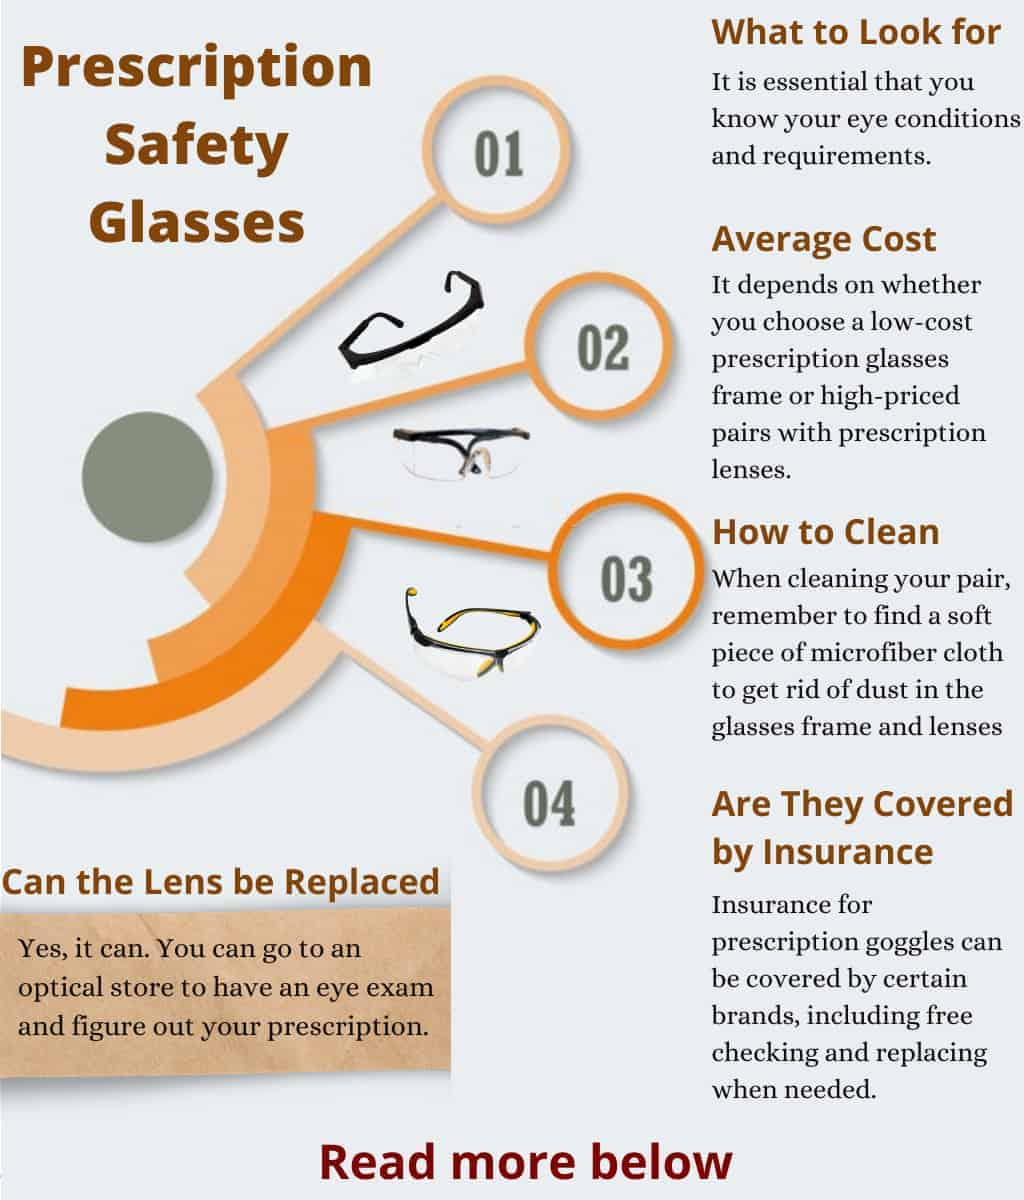 ansi-prescription-safety-glasses